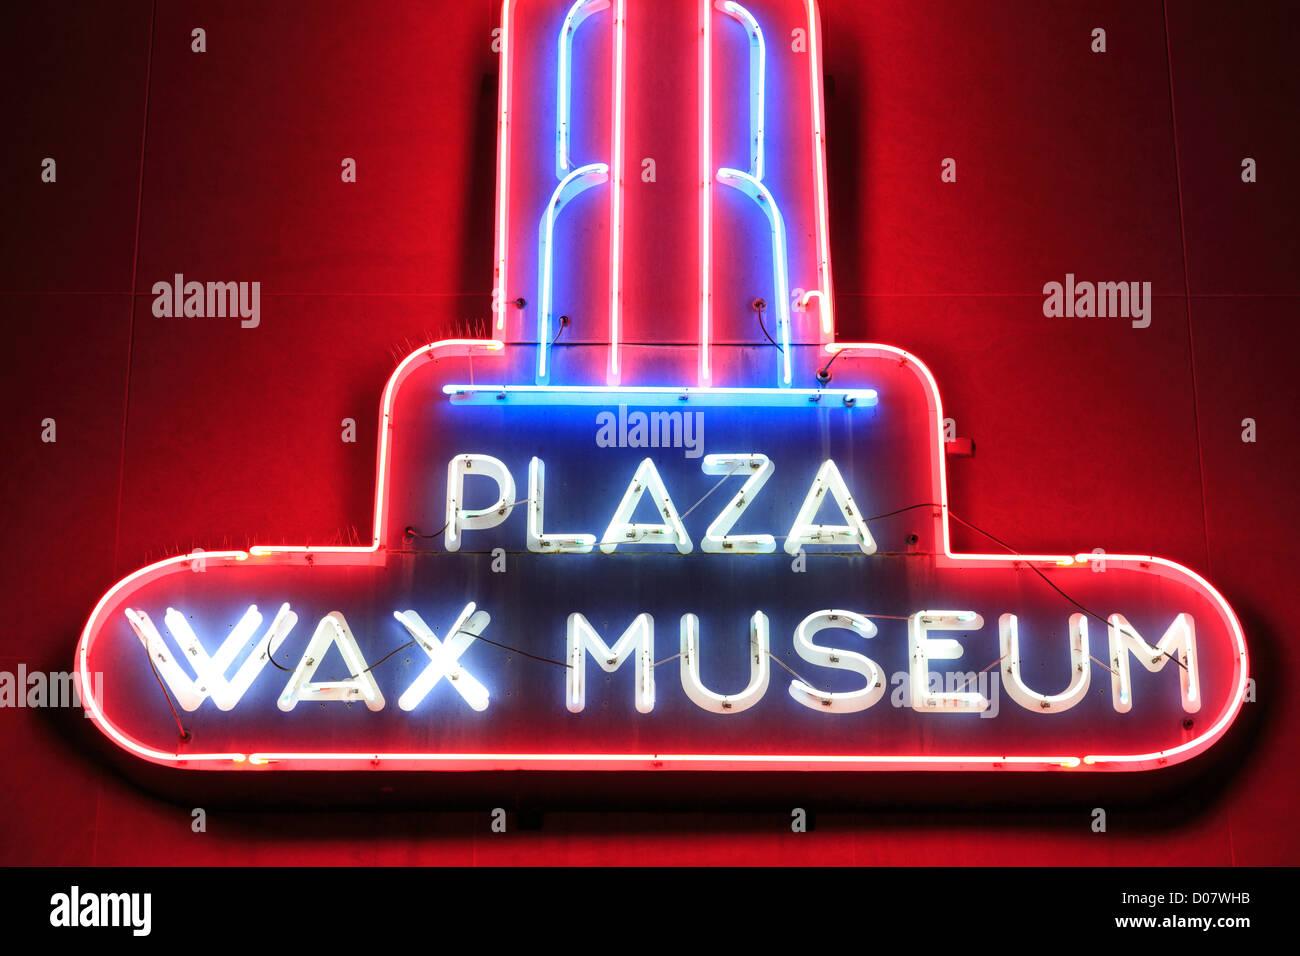 Plaza Wax Museum,Alamo Plaza,San Antonio,Texas,USA - Stock Image